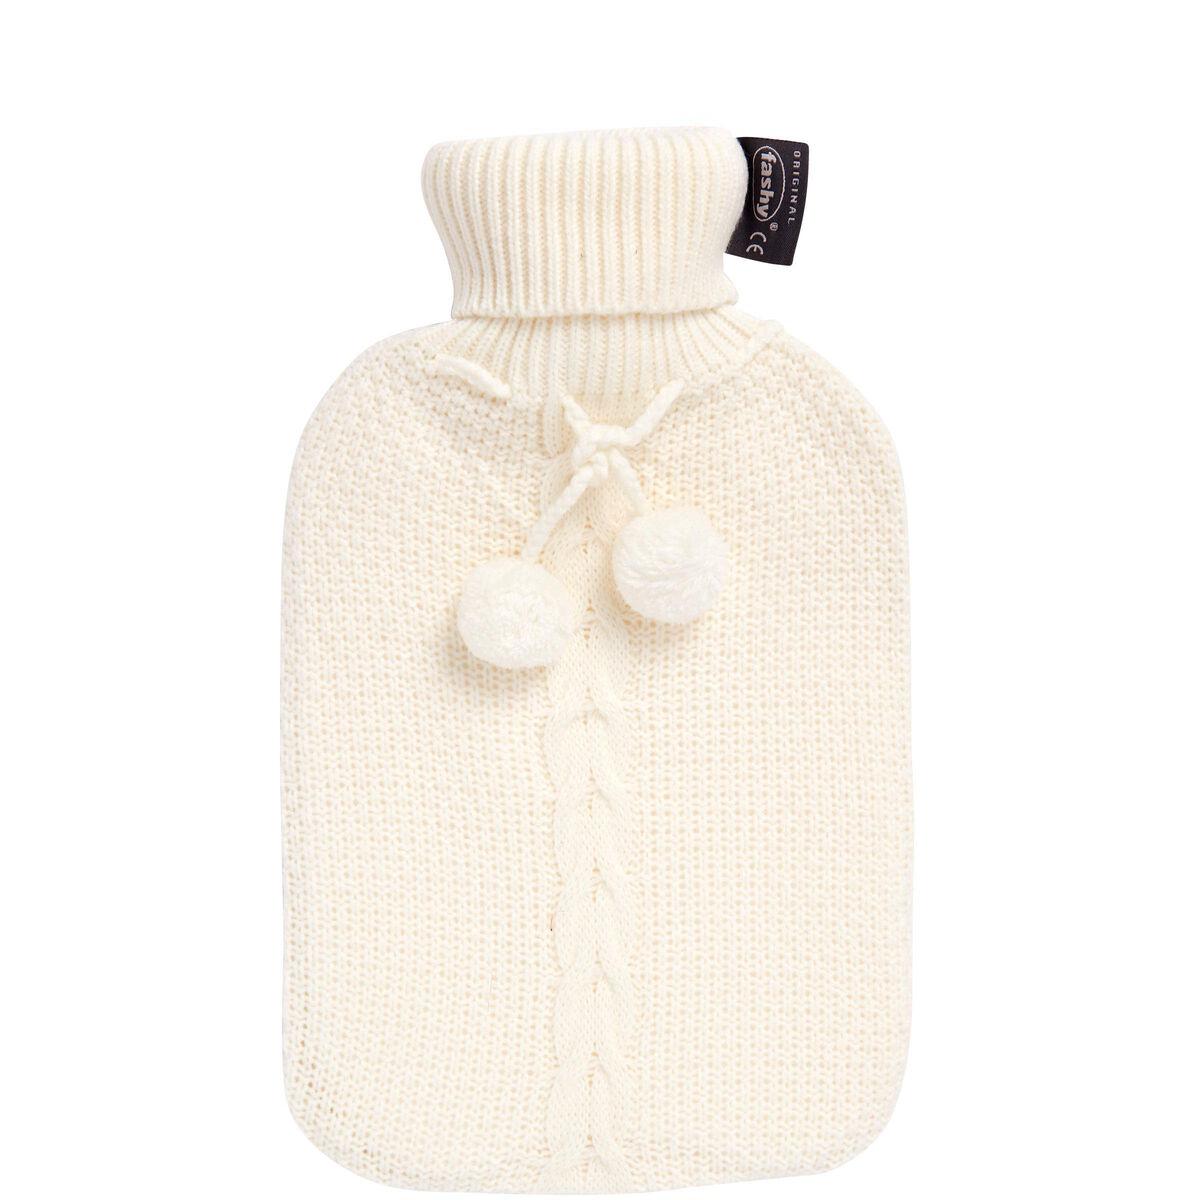 SOUL MAN Wärmflasche mit Strickbezug 2l